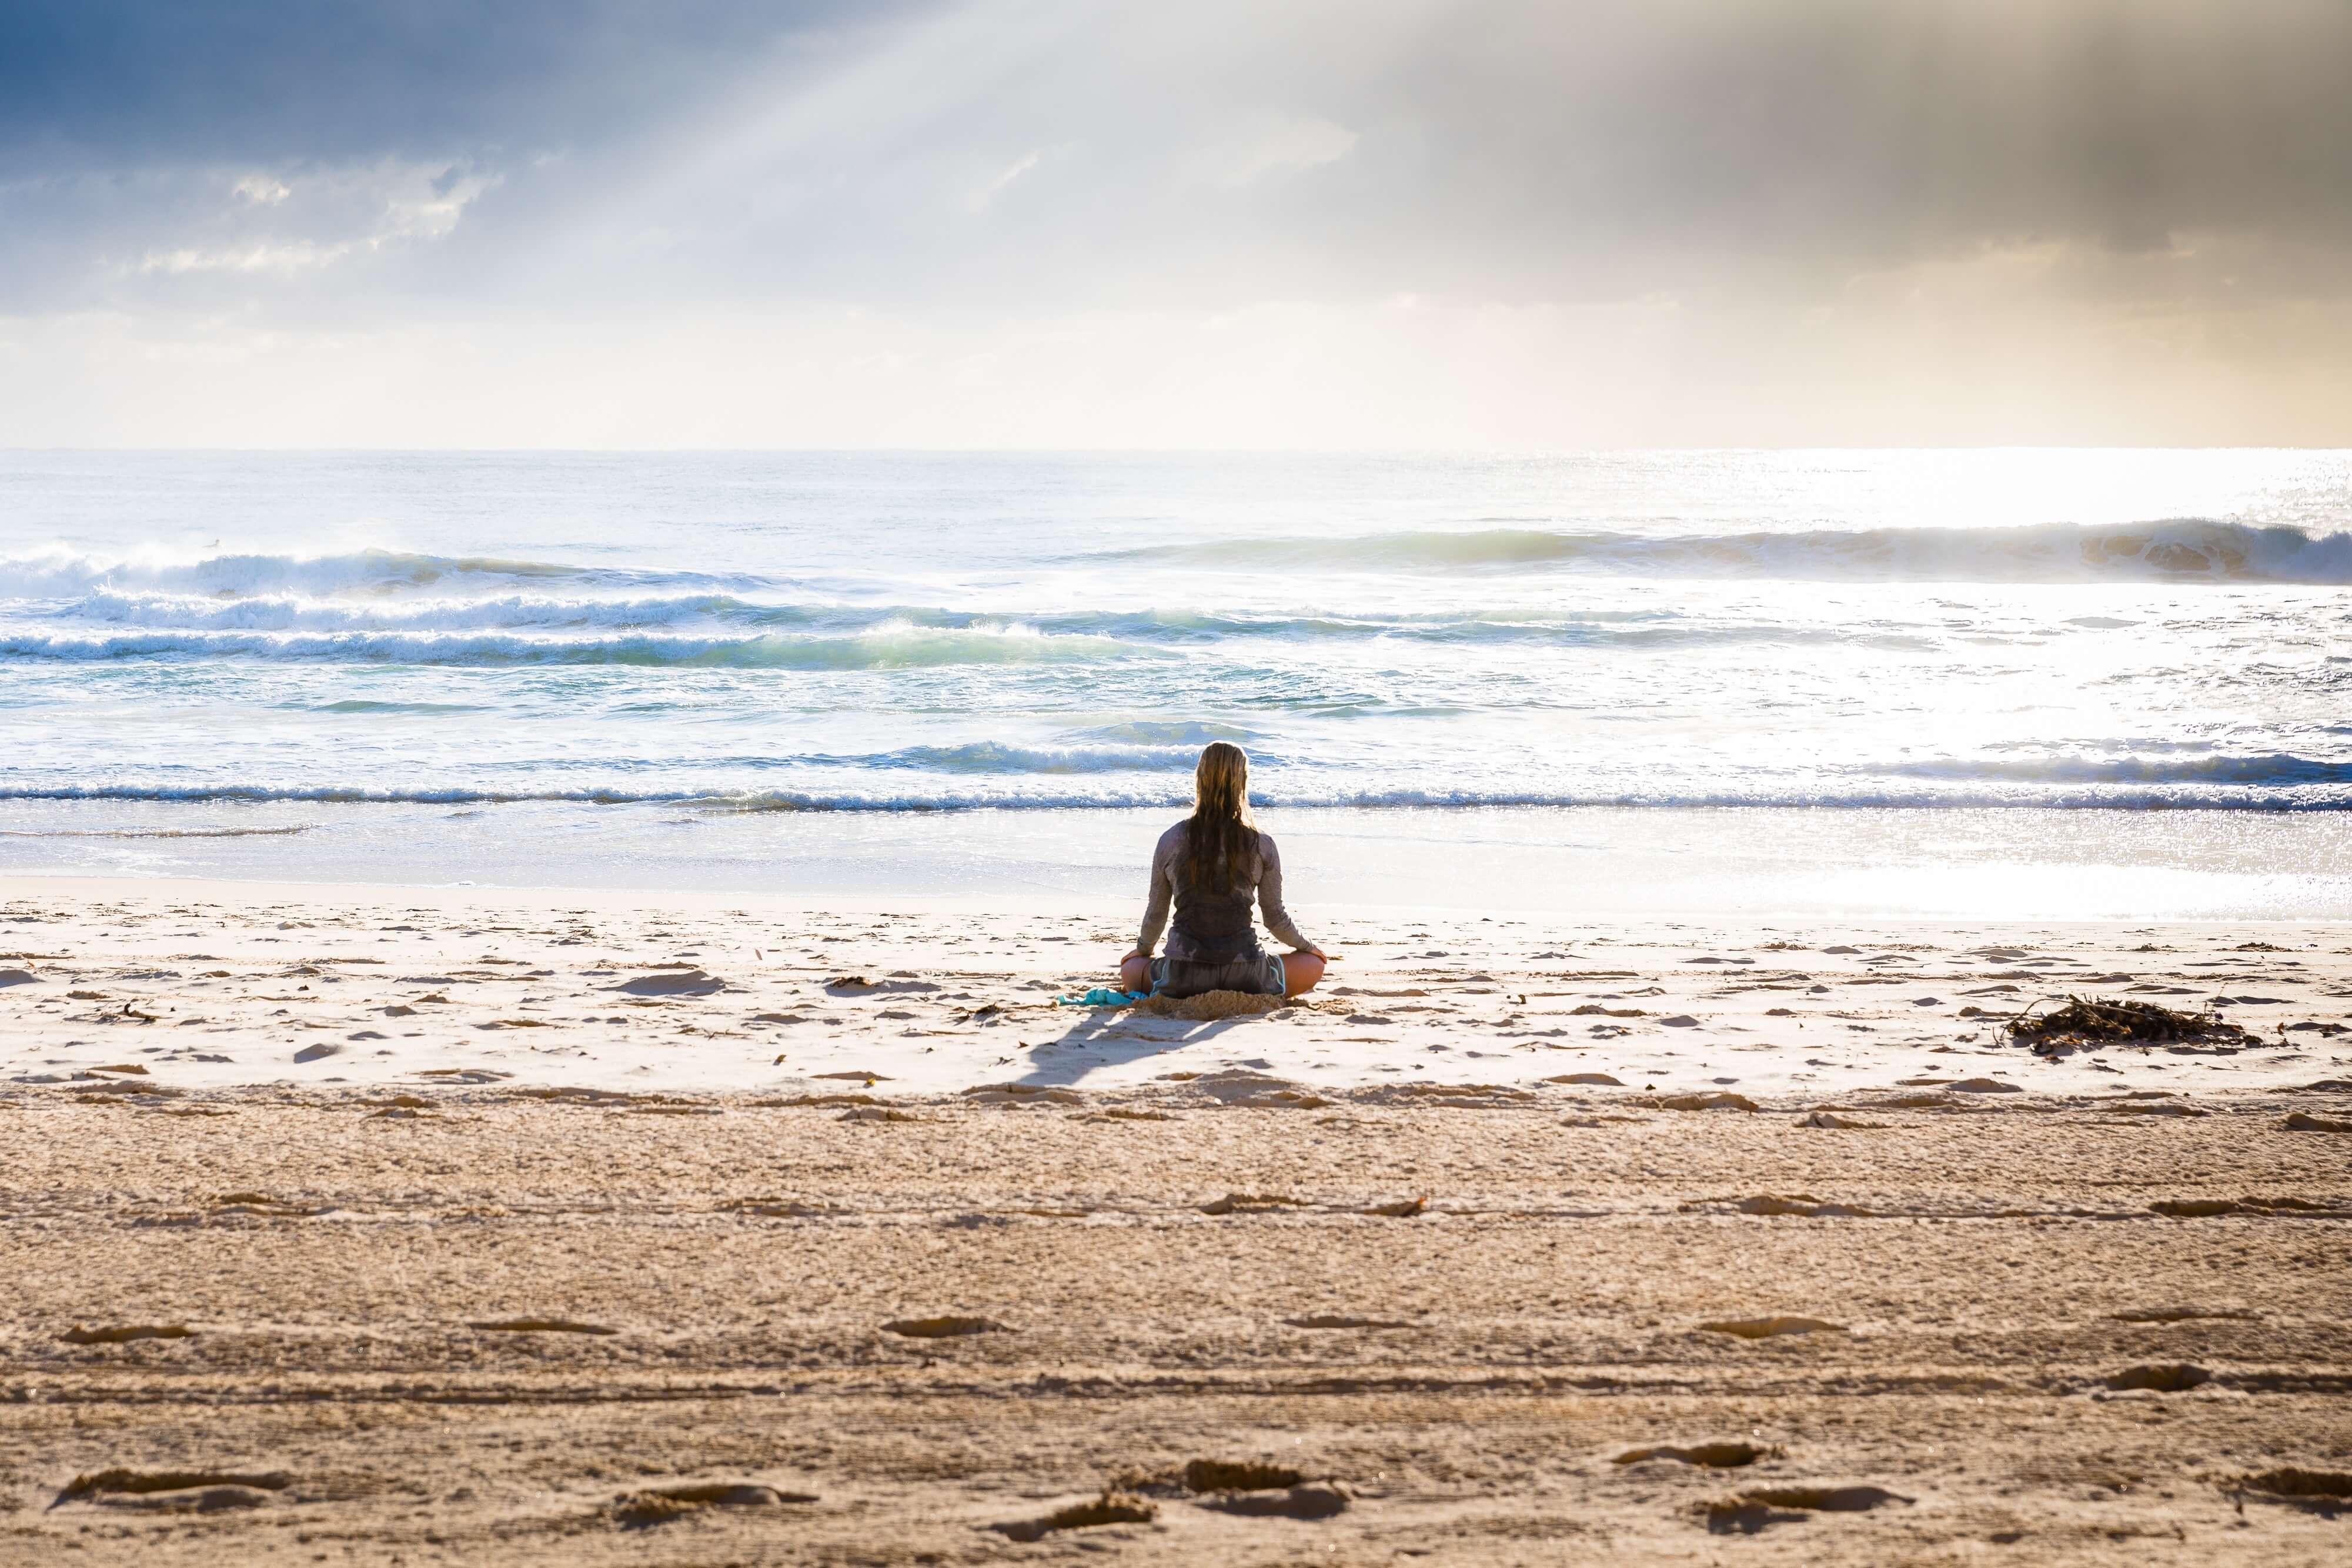 Person Sitting on Beach Near Ocean